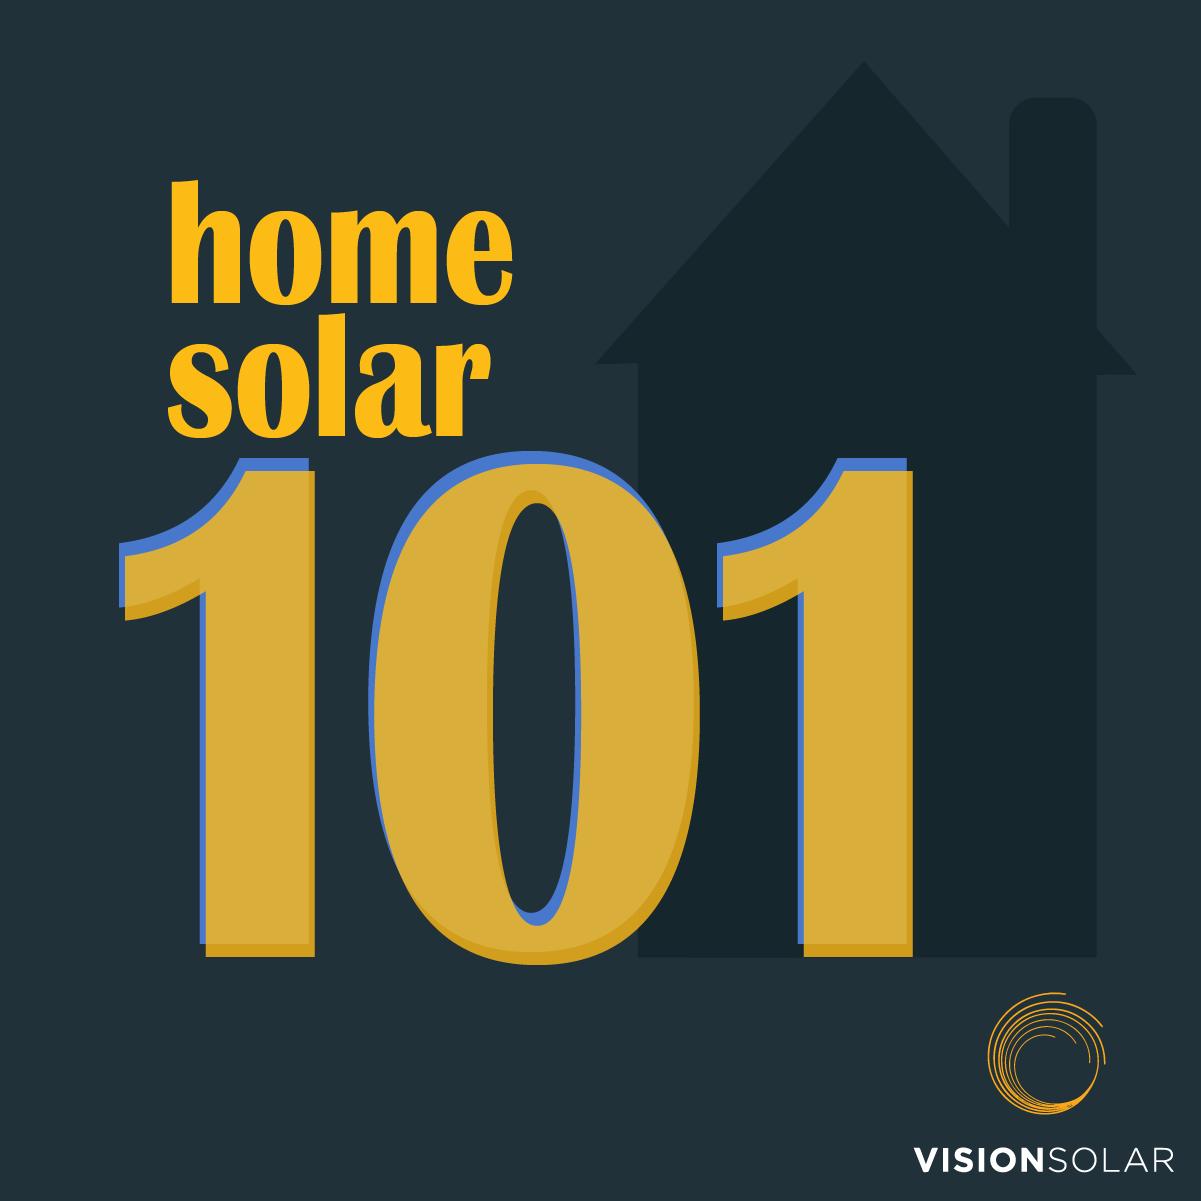 Vision Solar:Home Solar 101